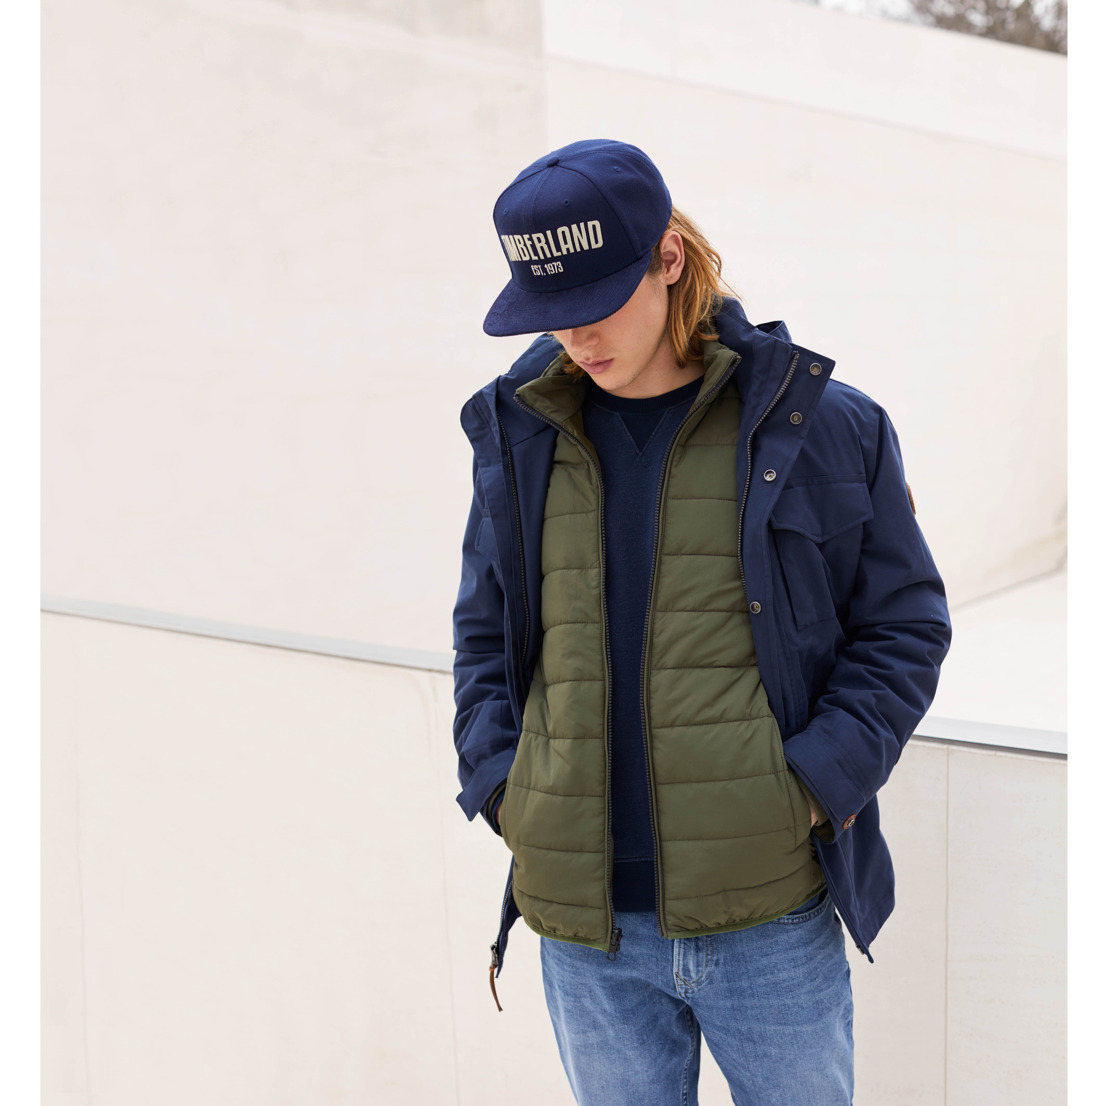 Timberland :: Men :: Apparel & Accessories :: Autumn/Winter 2017/2018